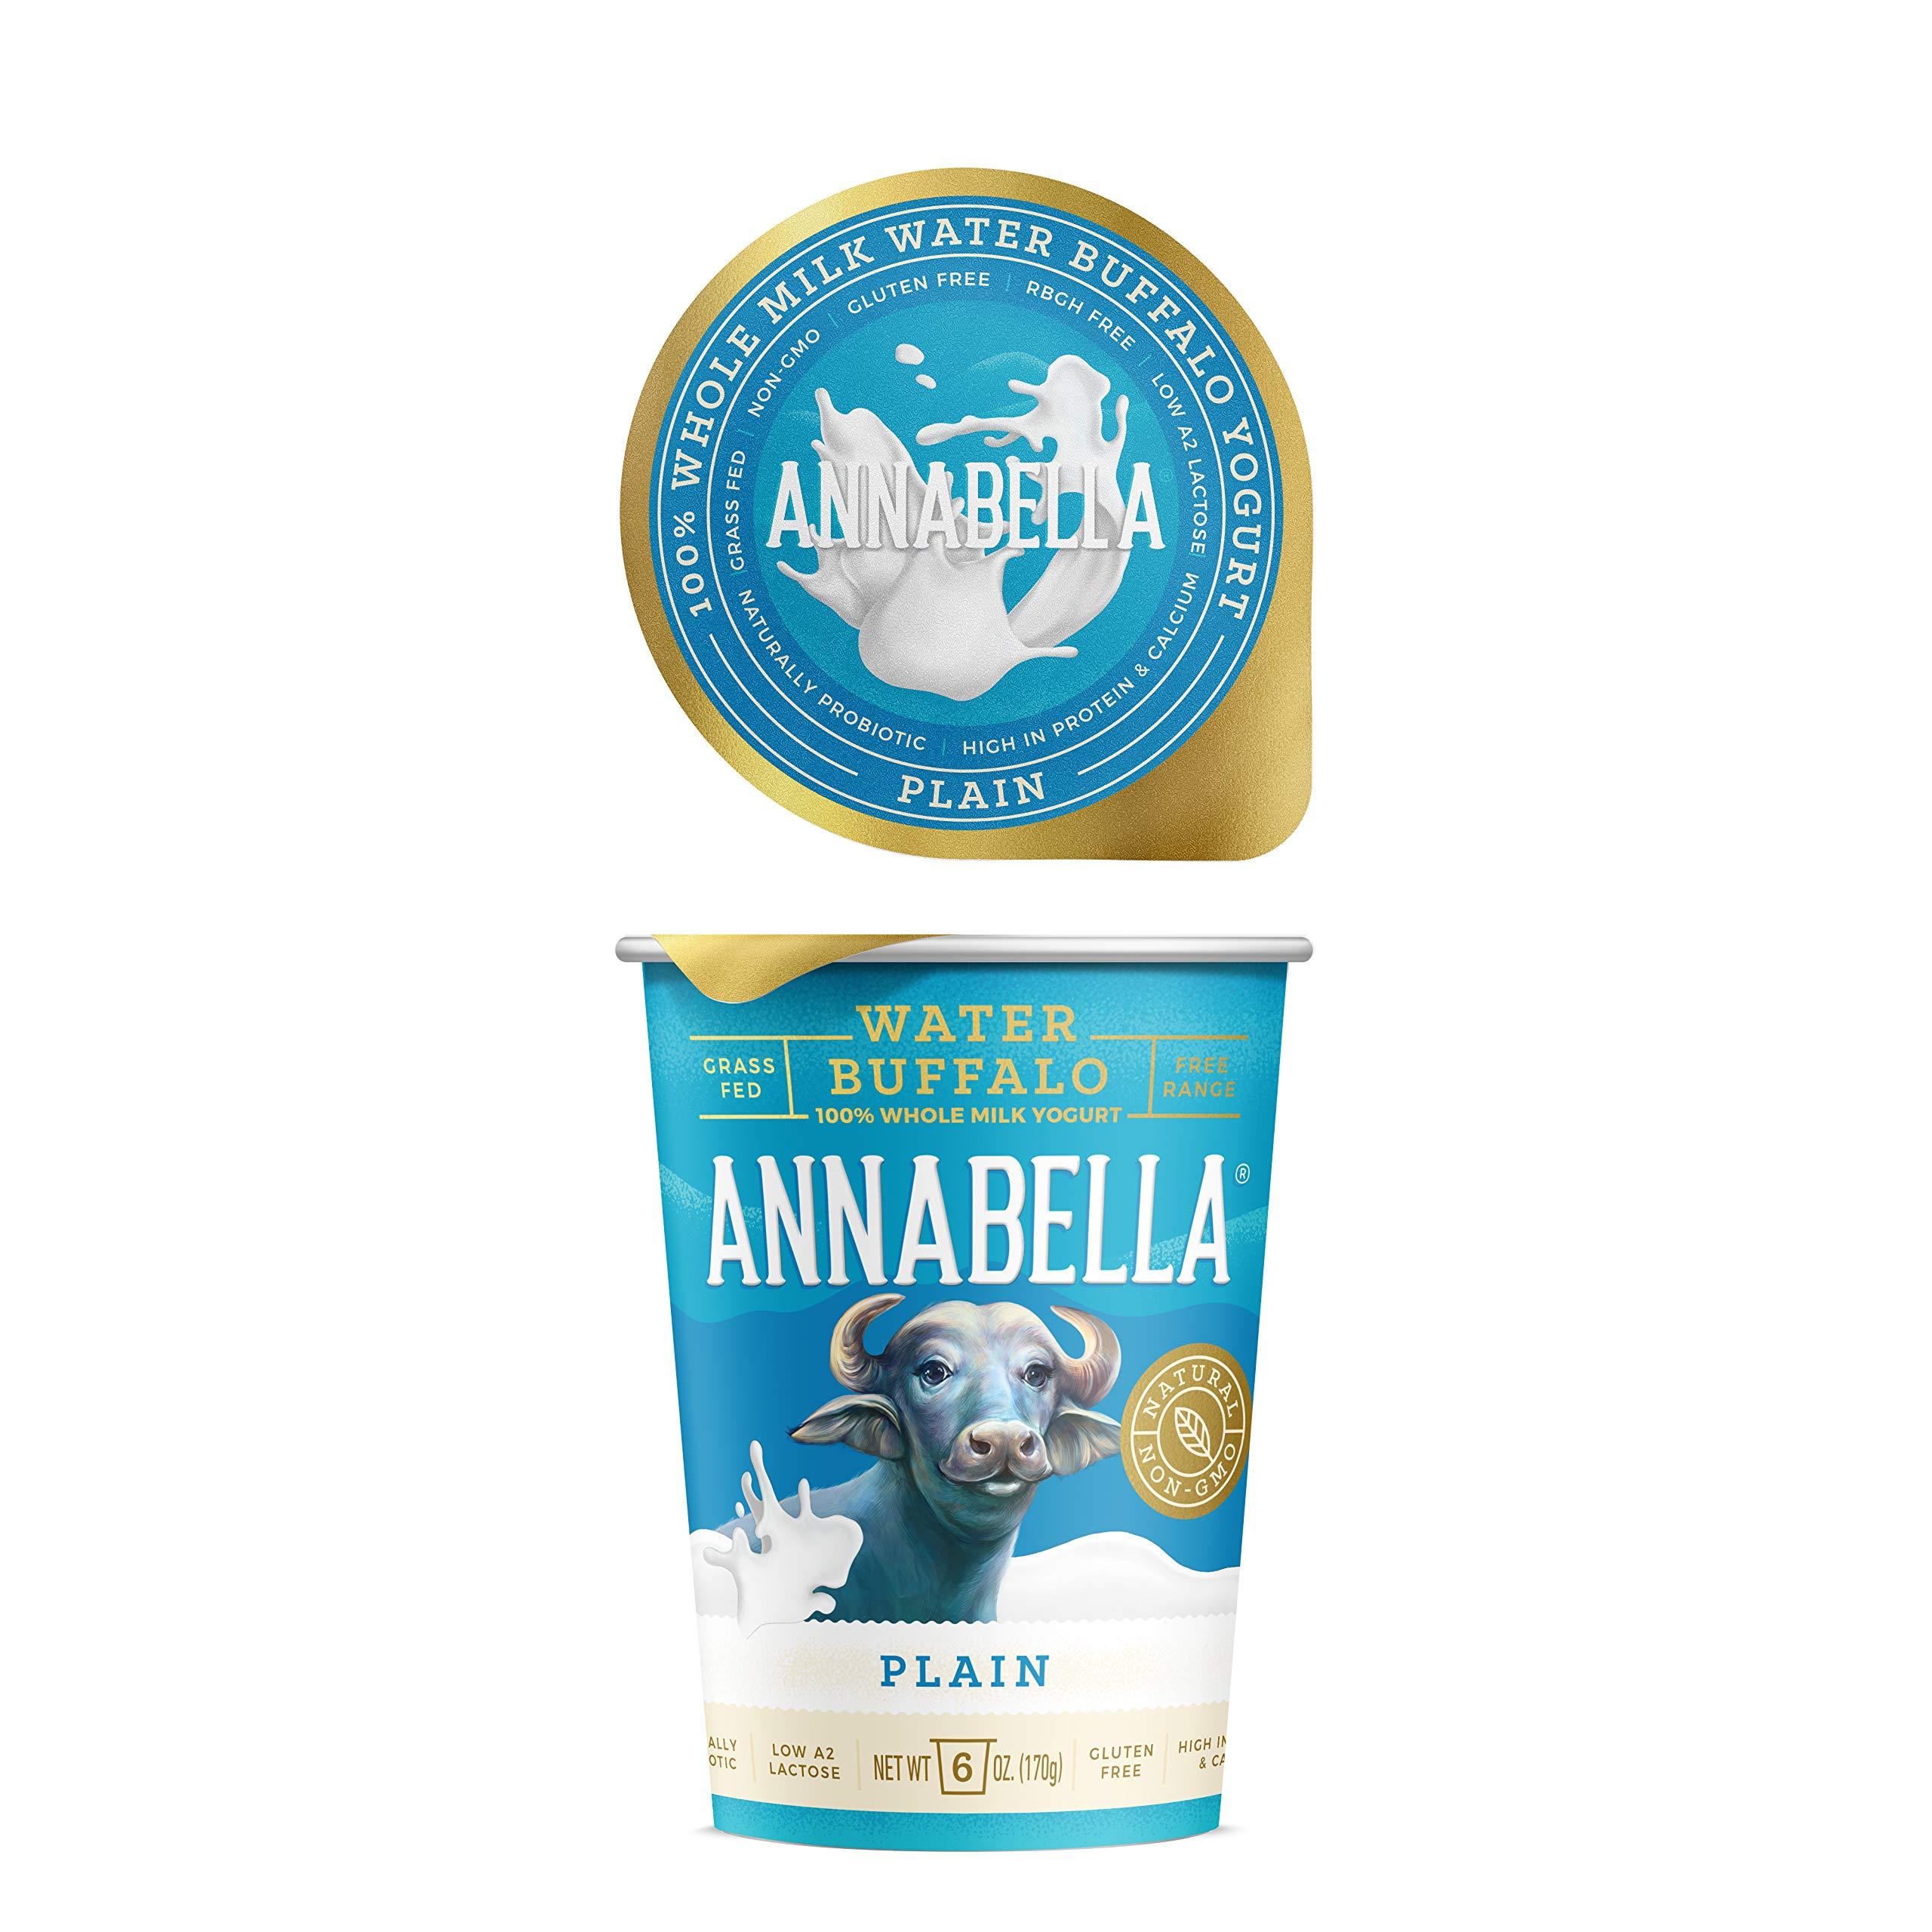 Annabella Water Buffalo Yogurt (Plain) / 6oz Cup-6 Cups per case